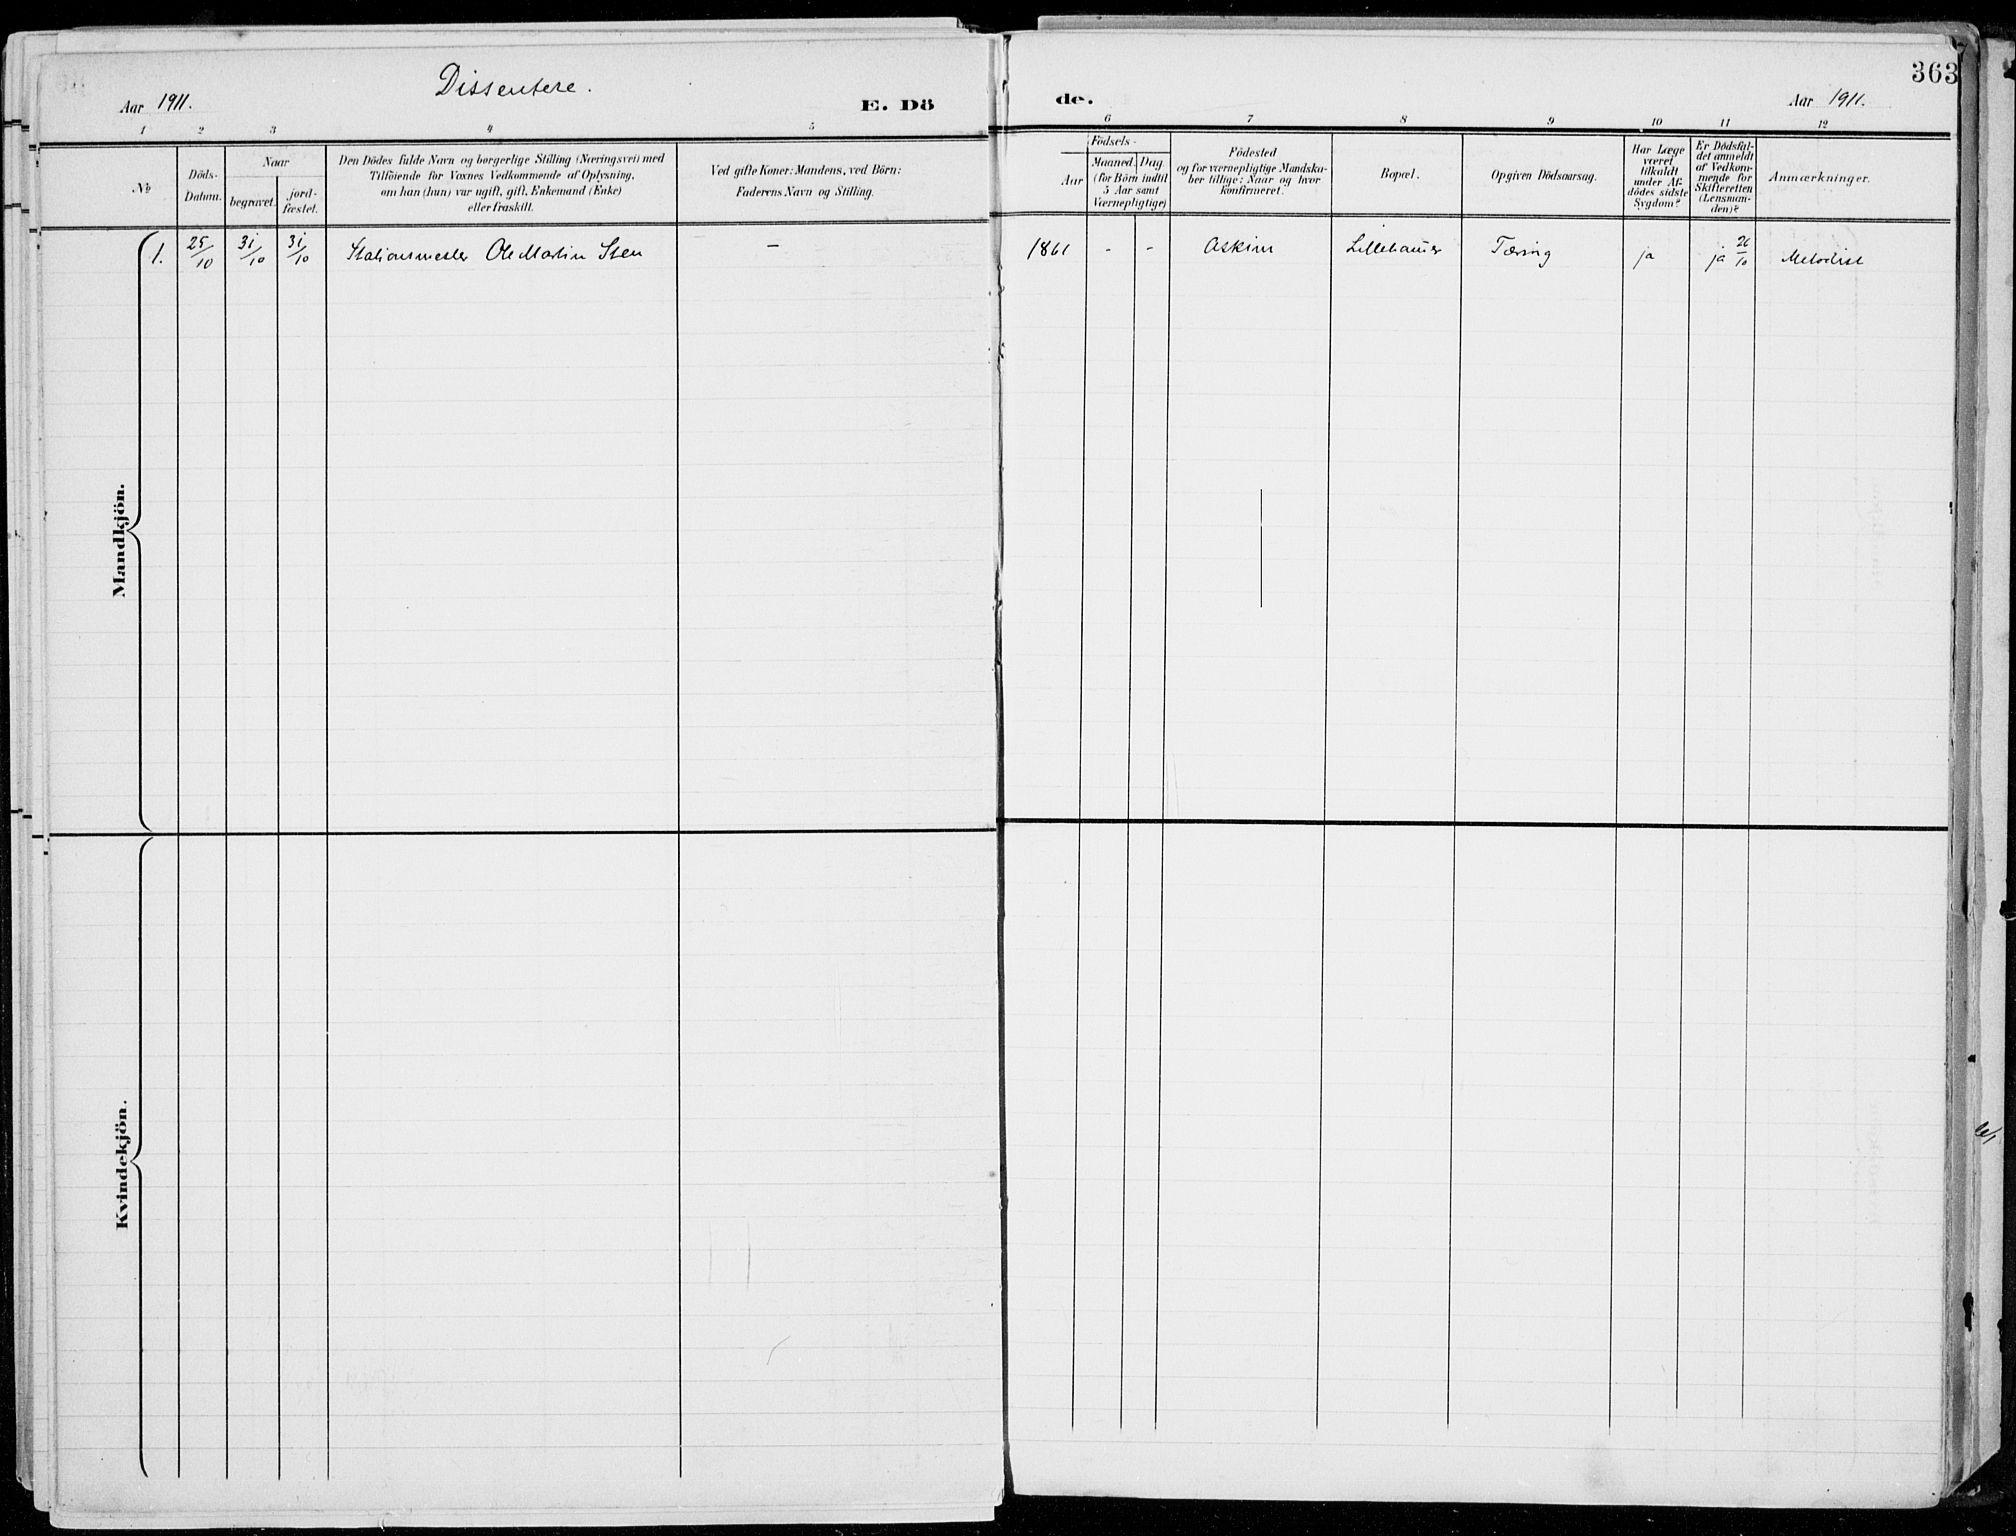 SAH, Lillehammer prestekontor, Ministerialbok nr. 1, 1901-1916, s. 363